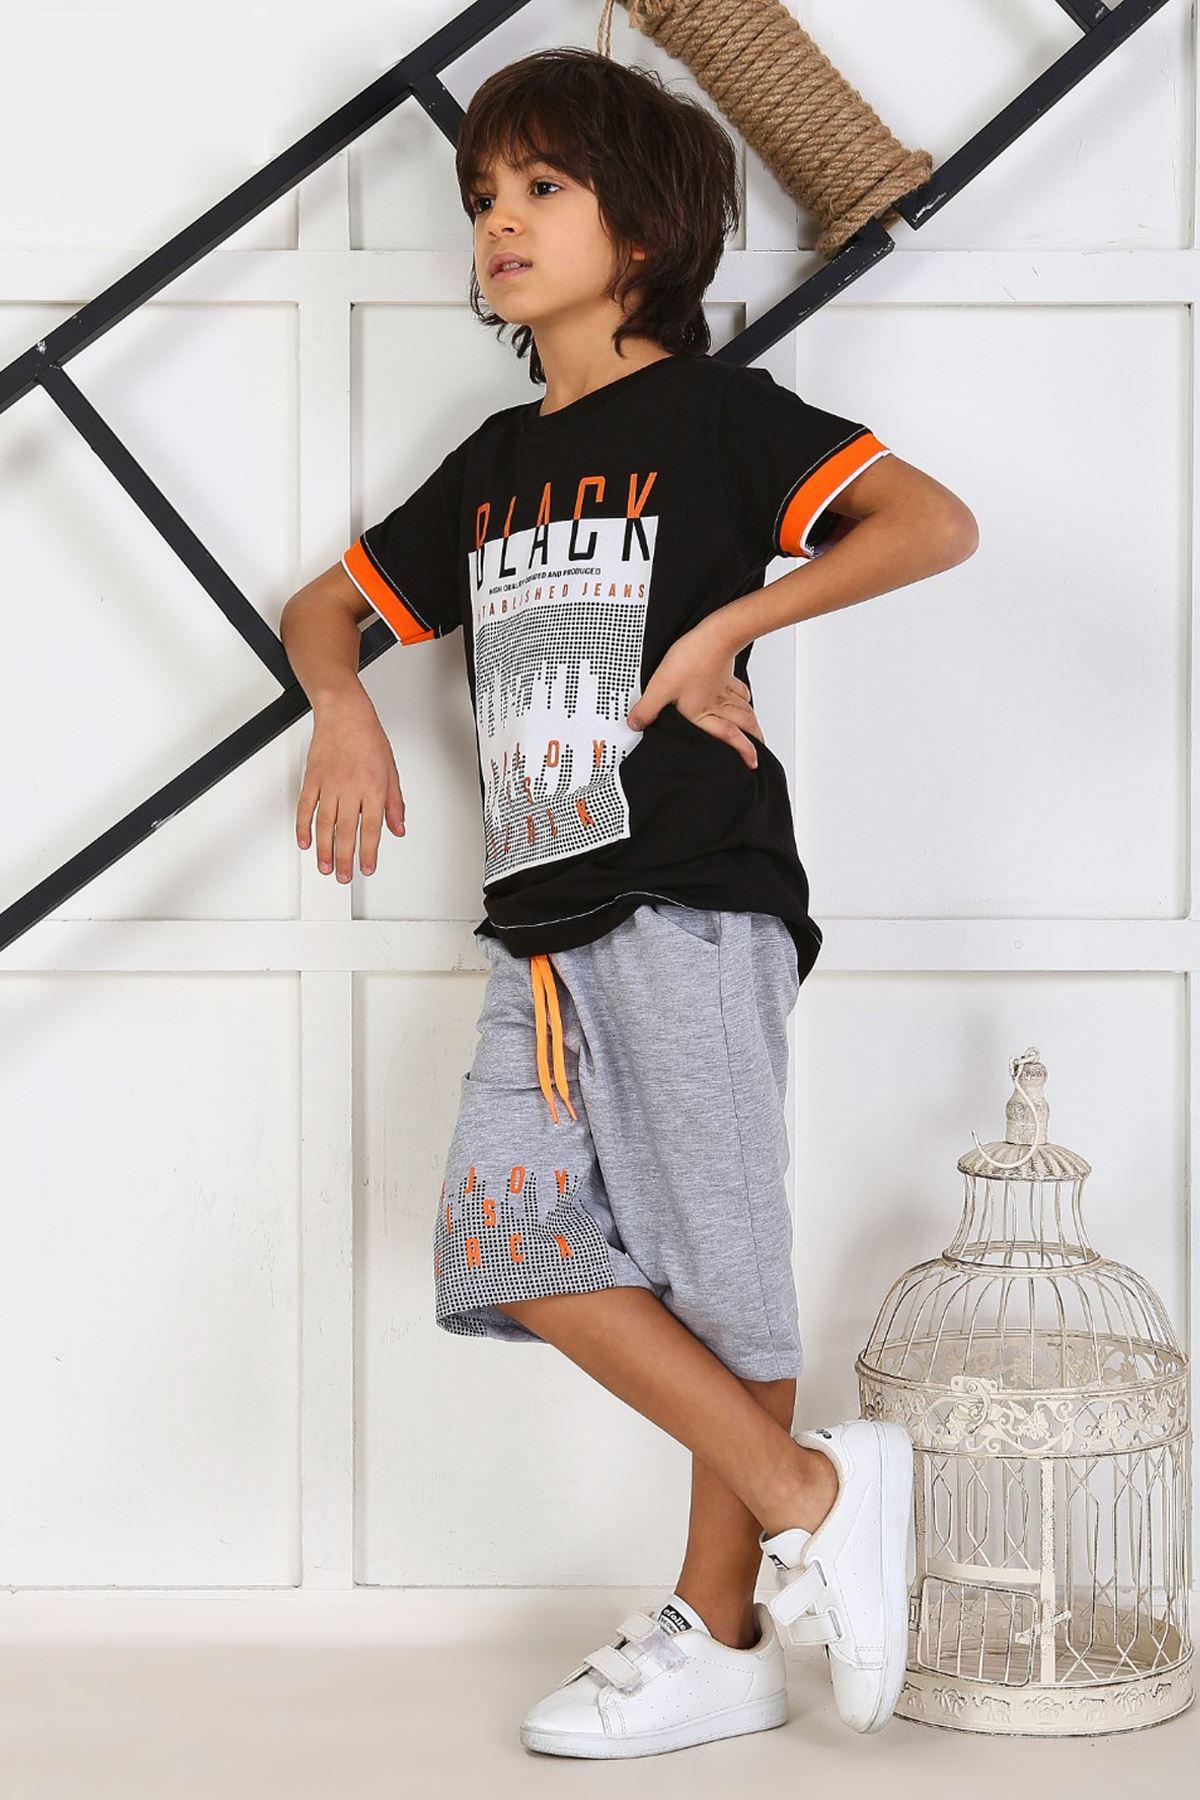 Navy Blue Gray Boy 'S Child Summer Capri Set 2 Pieces Male Clothes Capri T-shirt Casual Holiday Boys Kids cotton Outfits Children